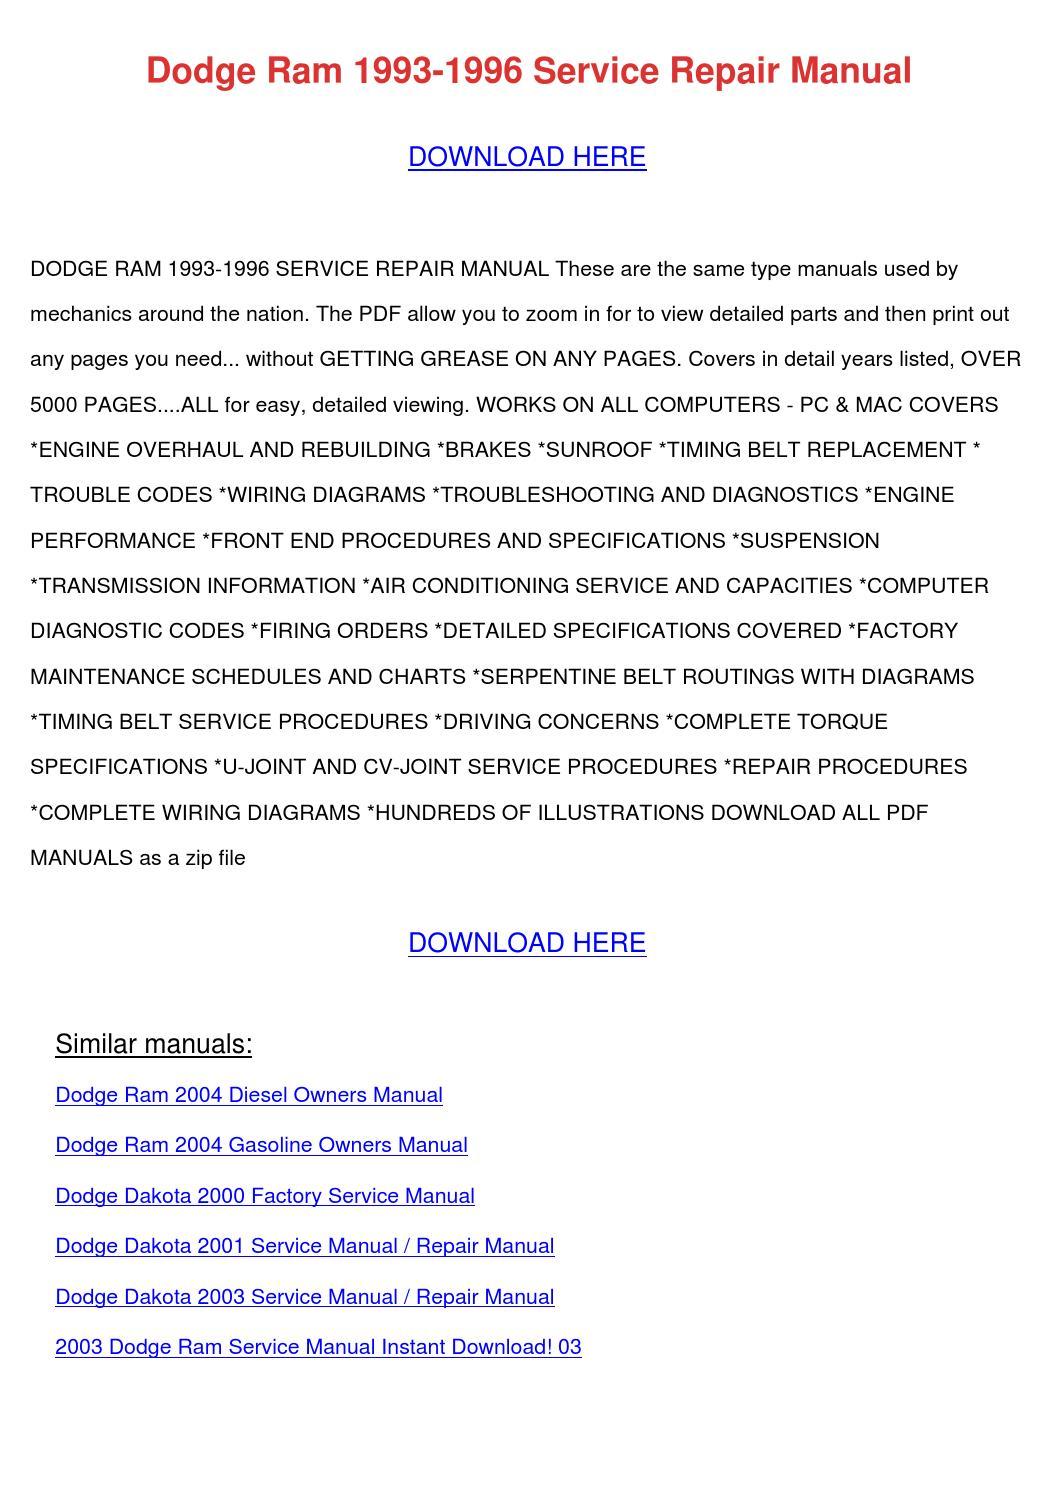 Dodge Ram 1993 1996 Service Repair Manual by LakeshaKessler - issuu